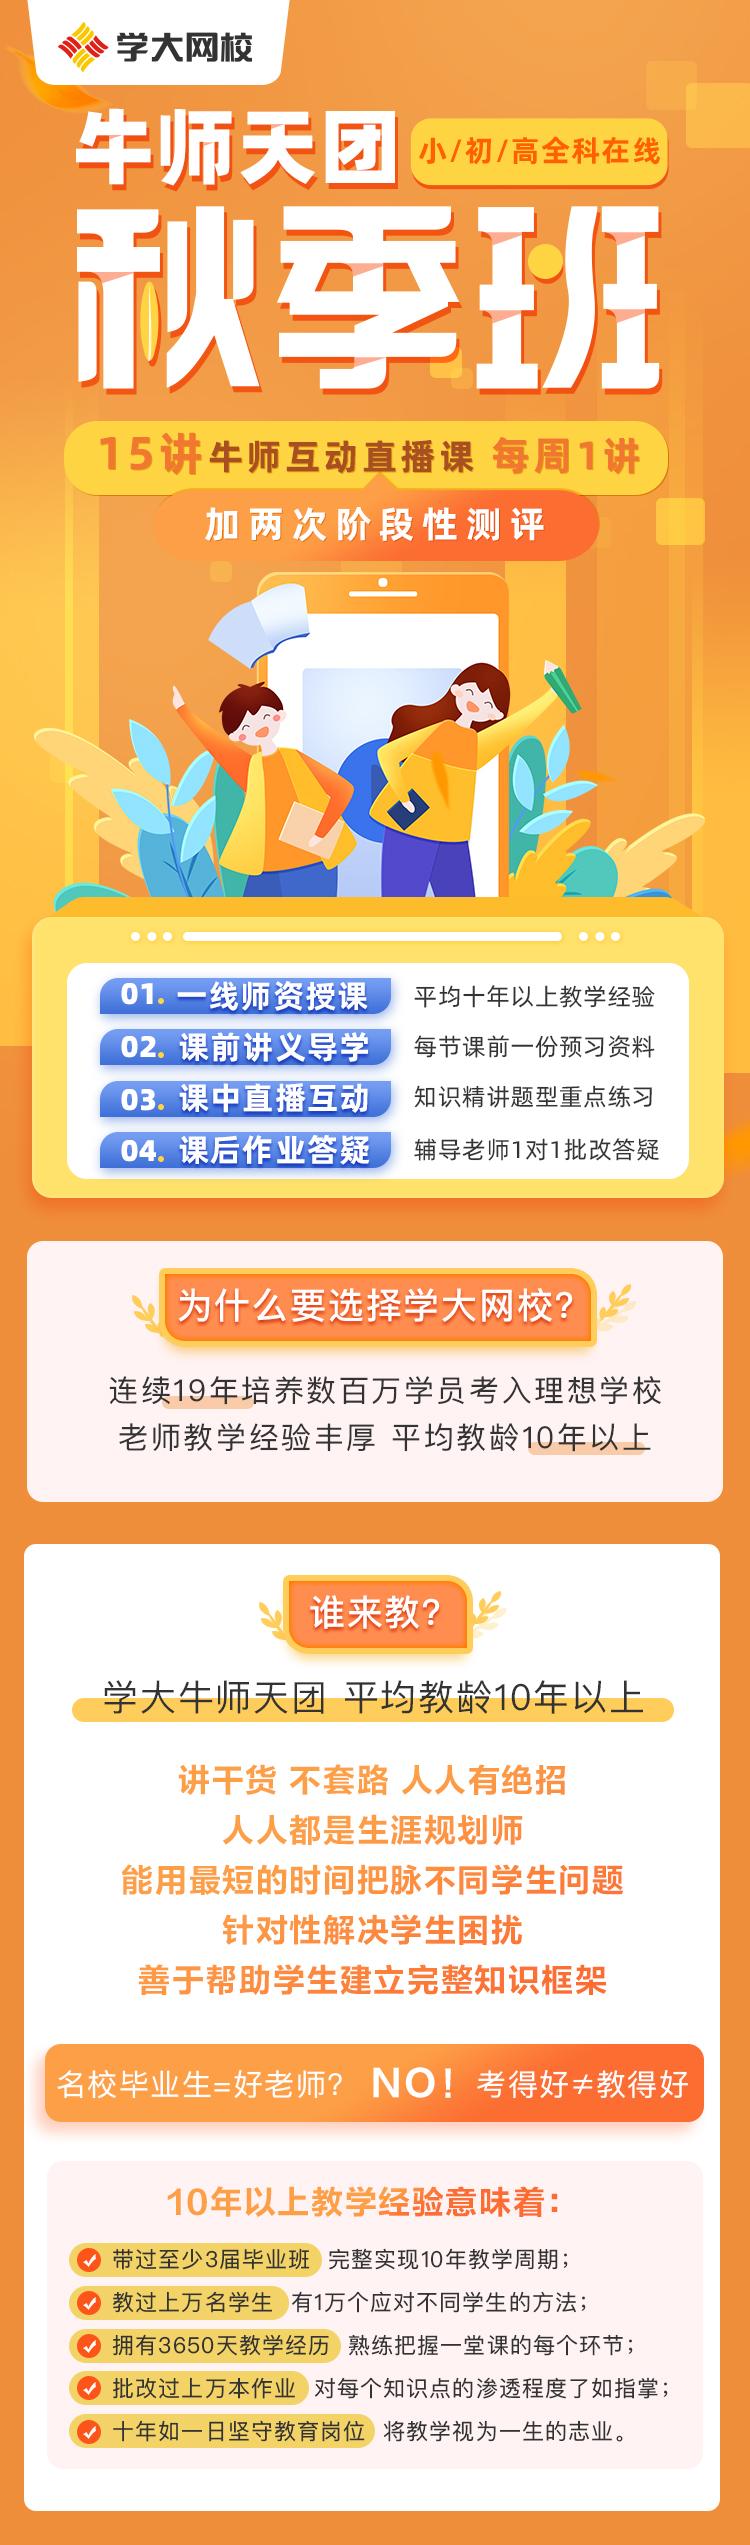 https://xdo-storage.oss-cn-beijing.aliyuncs.com/2020/08/07/iFyoGokfJE3Y9ZtxsQ7pKSYUK7LIbp33HAvFRx26.jpeg